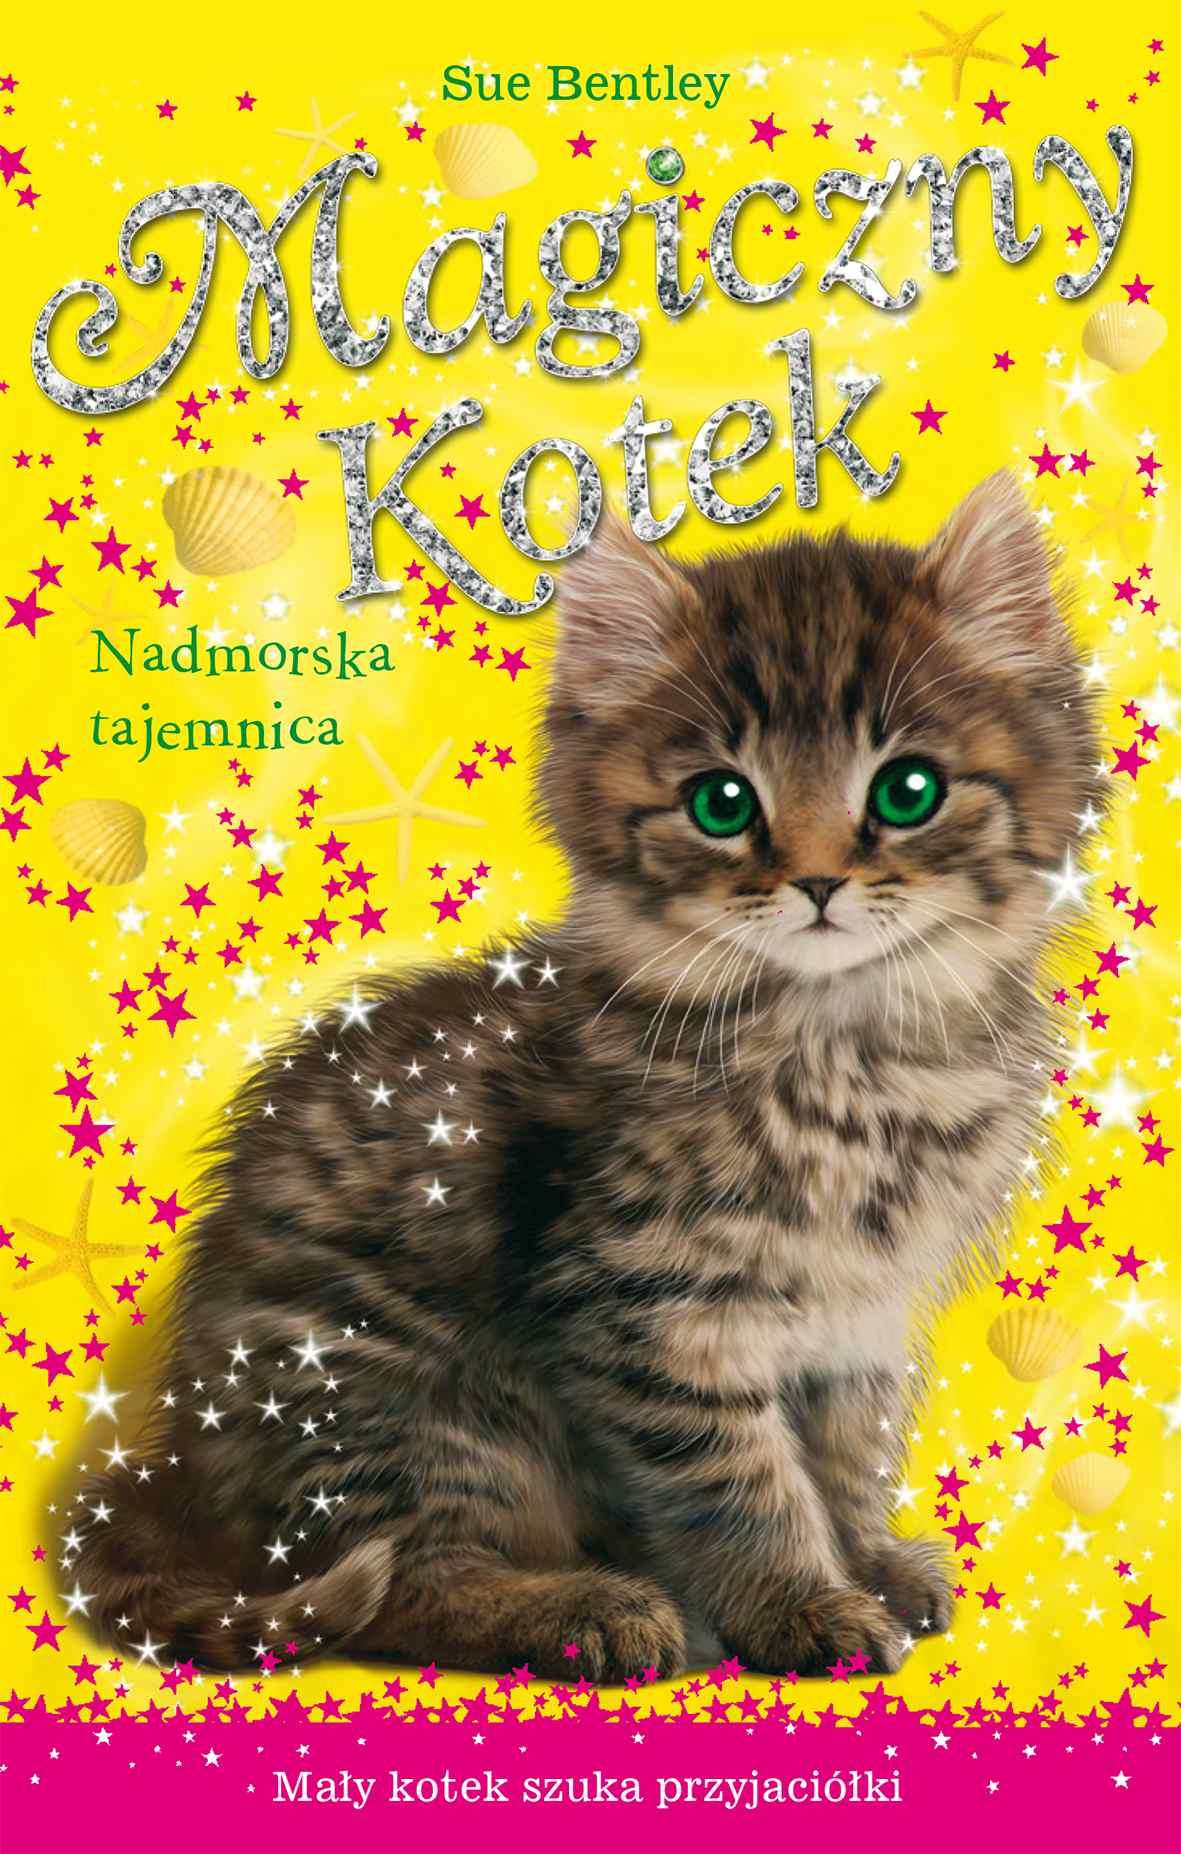 Nadmorska tajemnica. Magiczny kotek - Ebook (Książka na Kindle) do pobrania w formacie MOBI